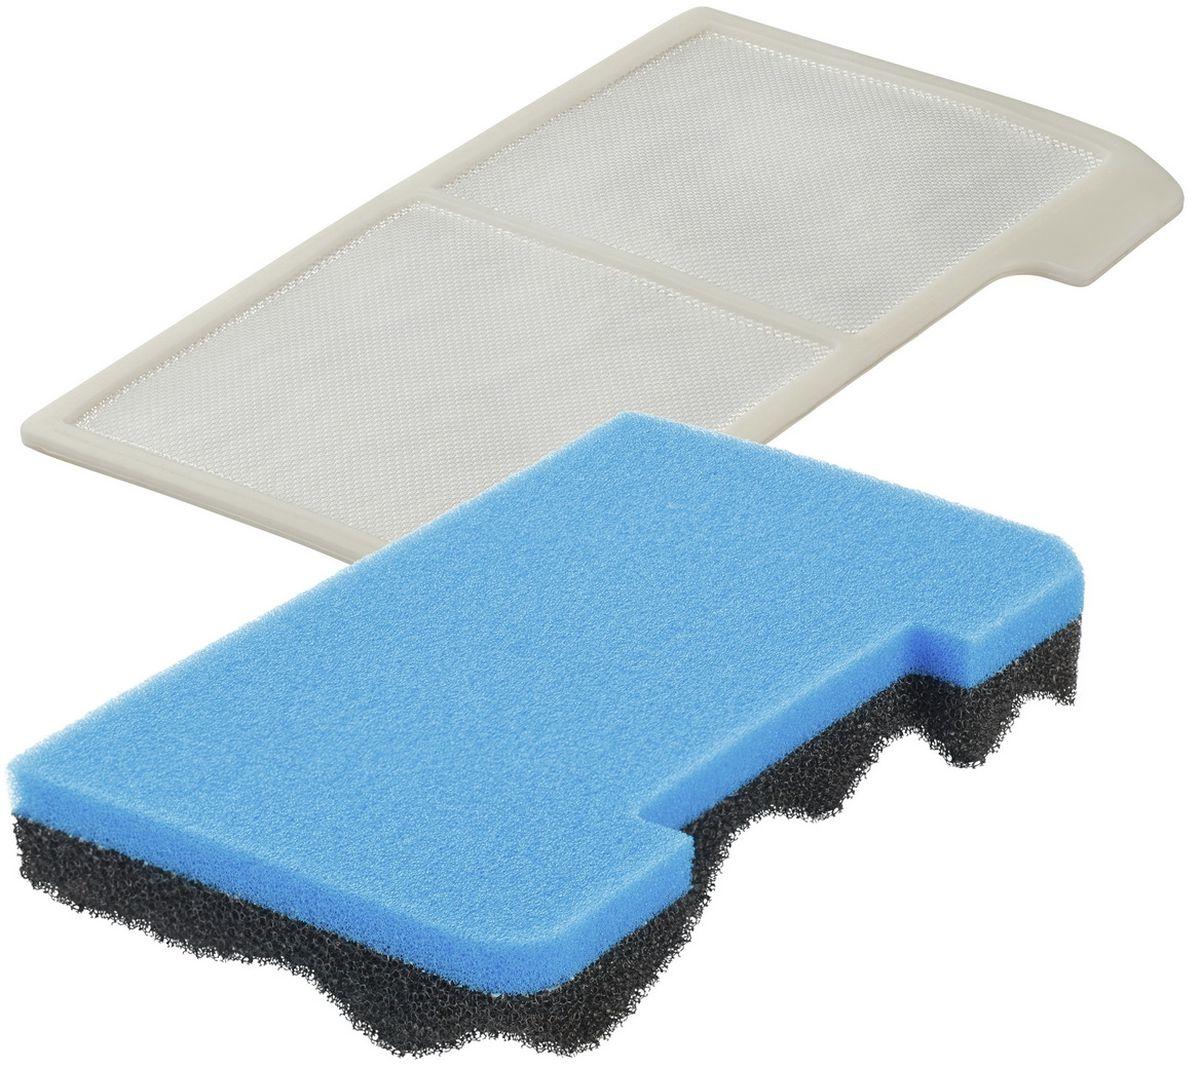 Neolux FLG-73 набор моторных фильтров для пылесоса LG neolux fvx 01 набор фильтров для пылесоса vax 3 шт